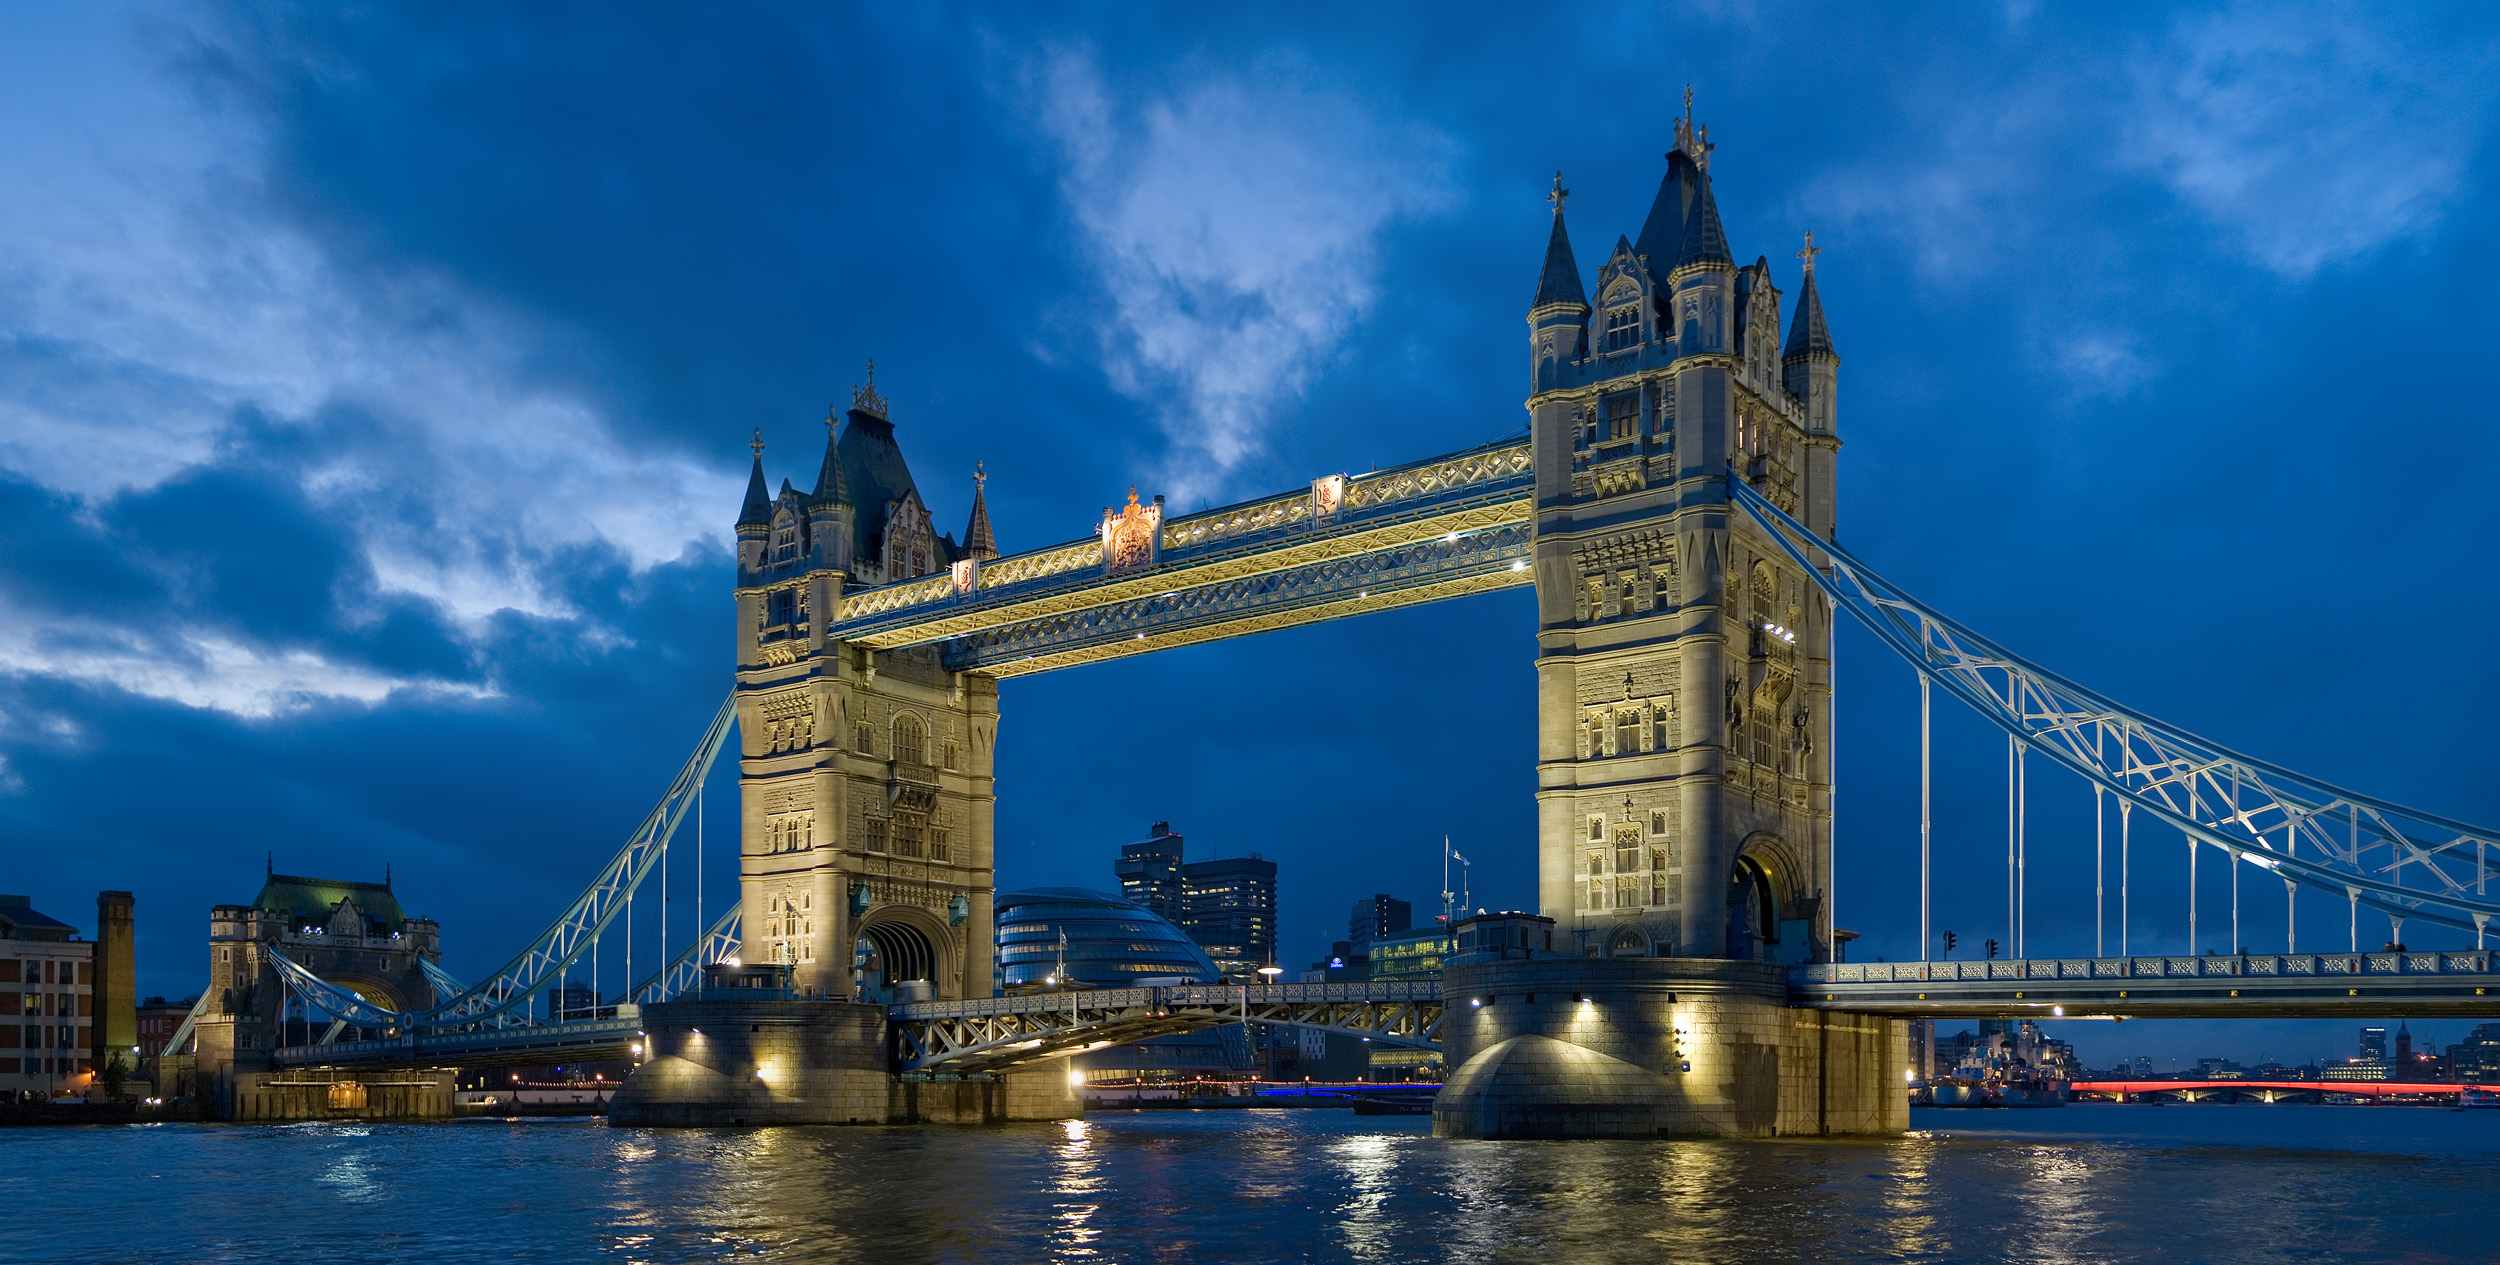 Student exchange to the UK via the Erasmus program is no longer possible